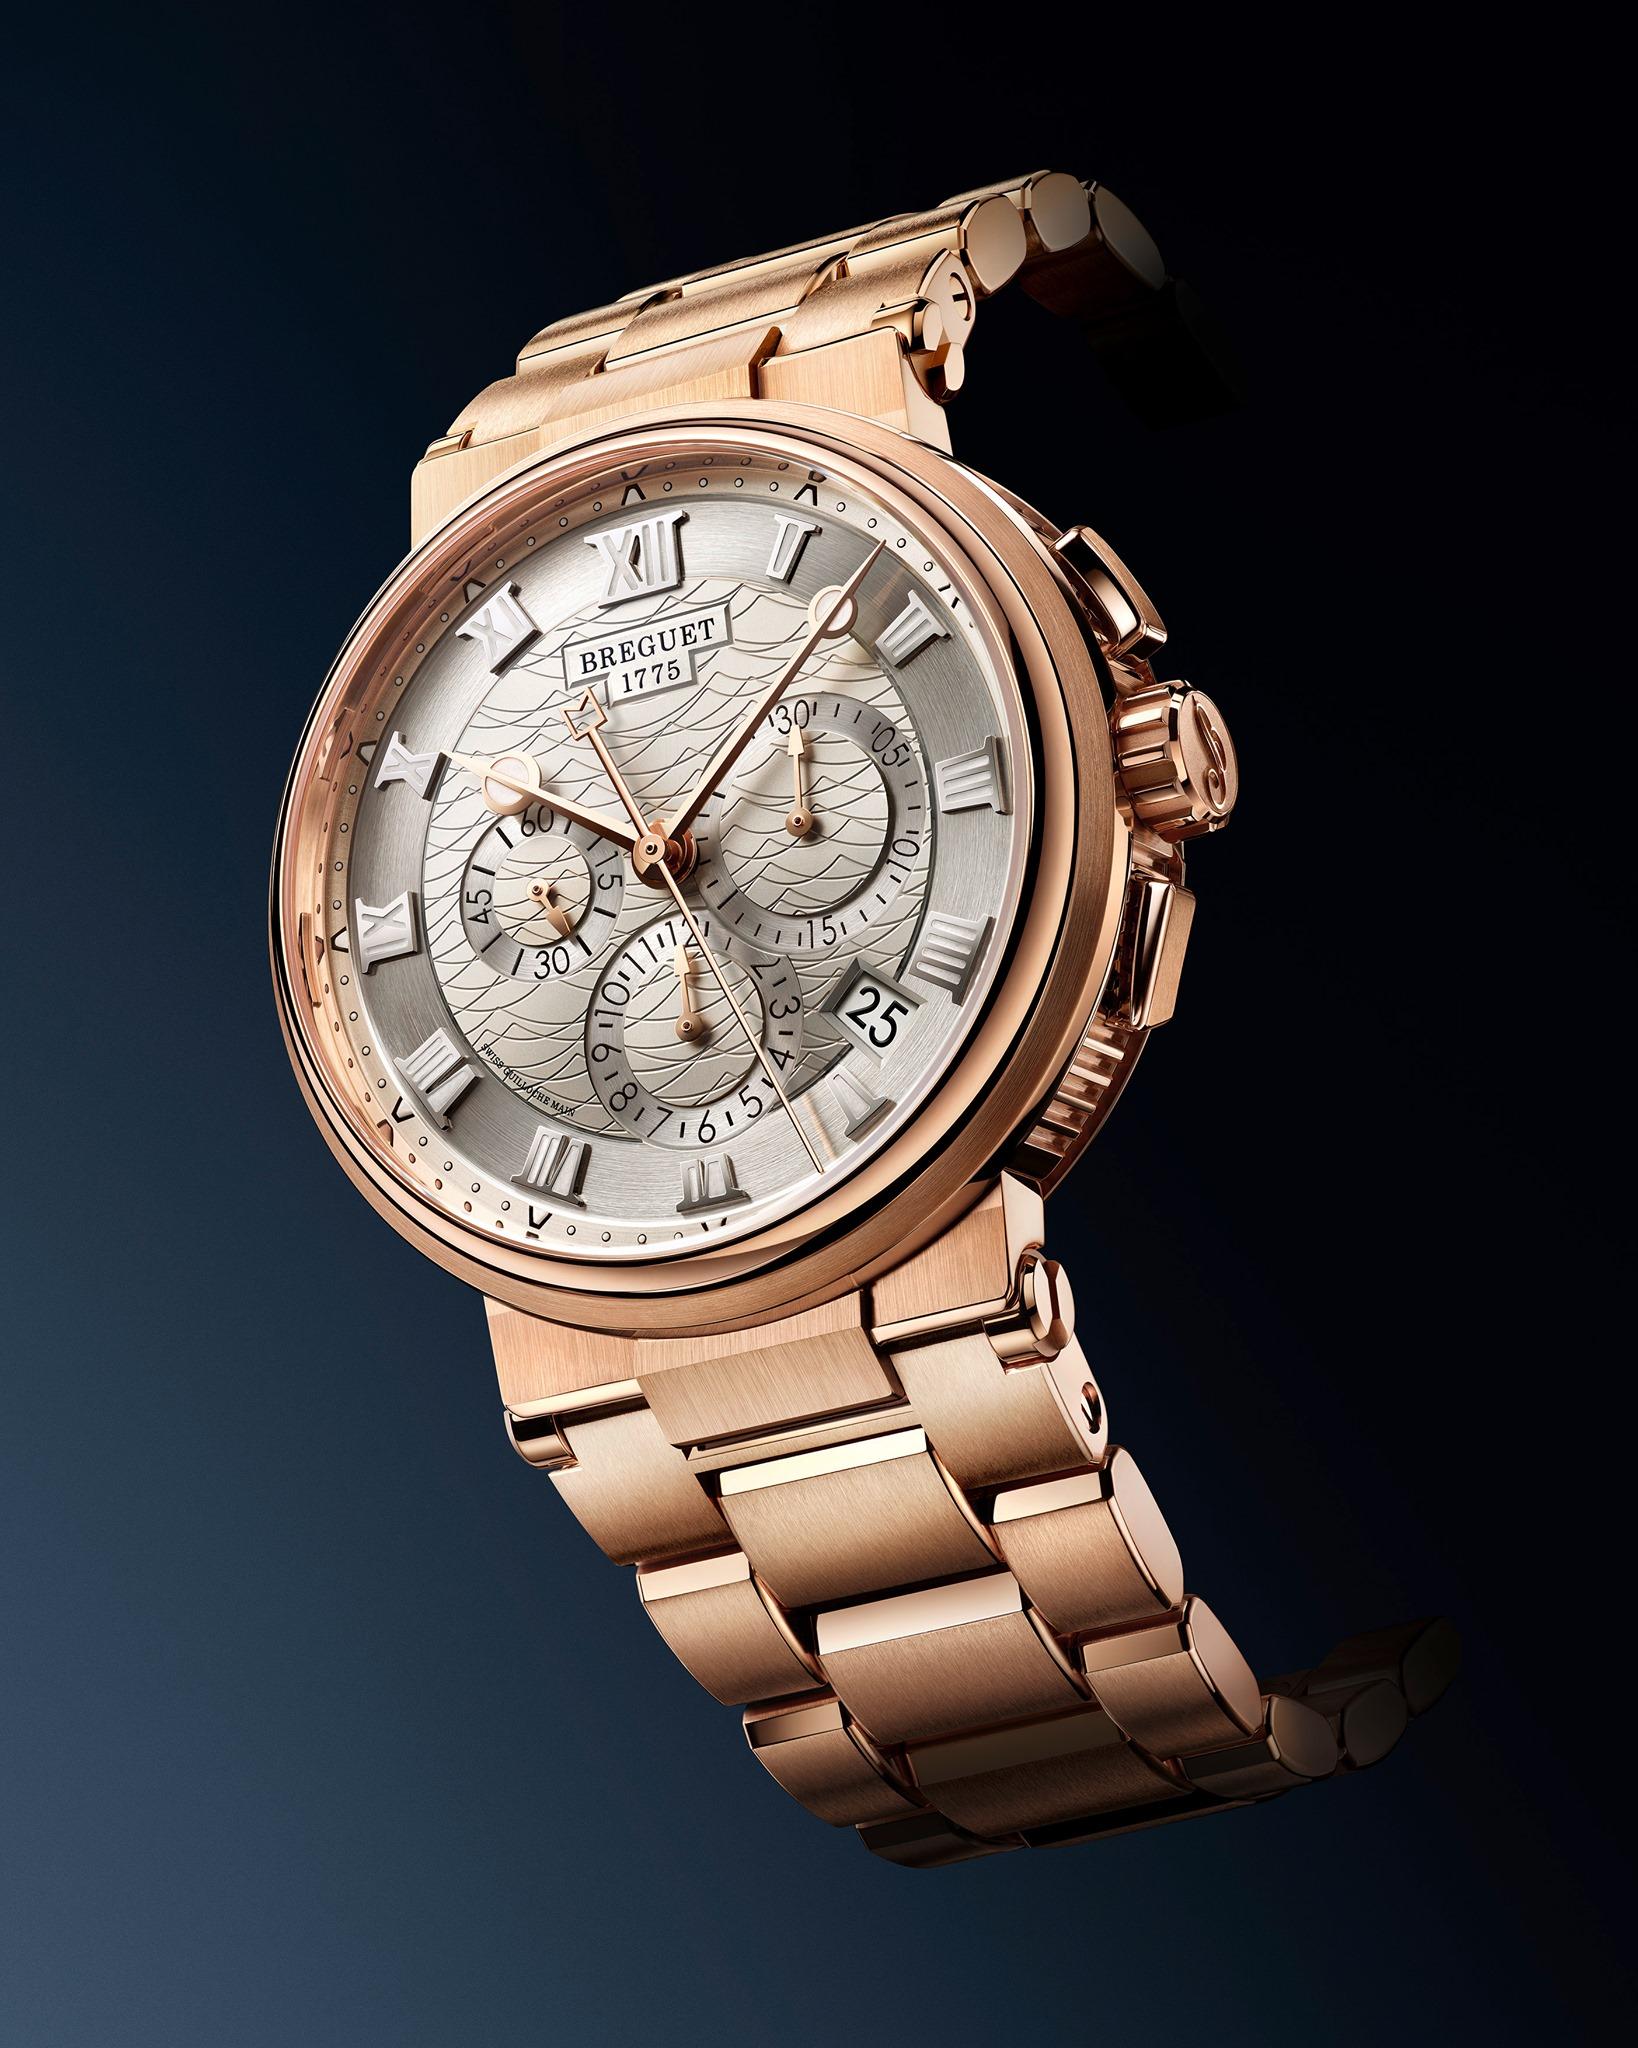 Breguet Marine Chronographe 5527 oro rosa feat